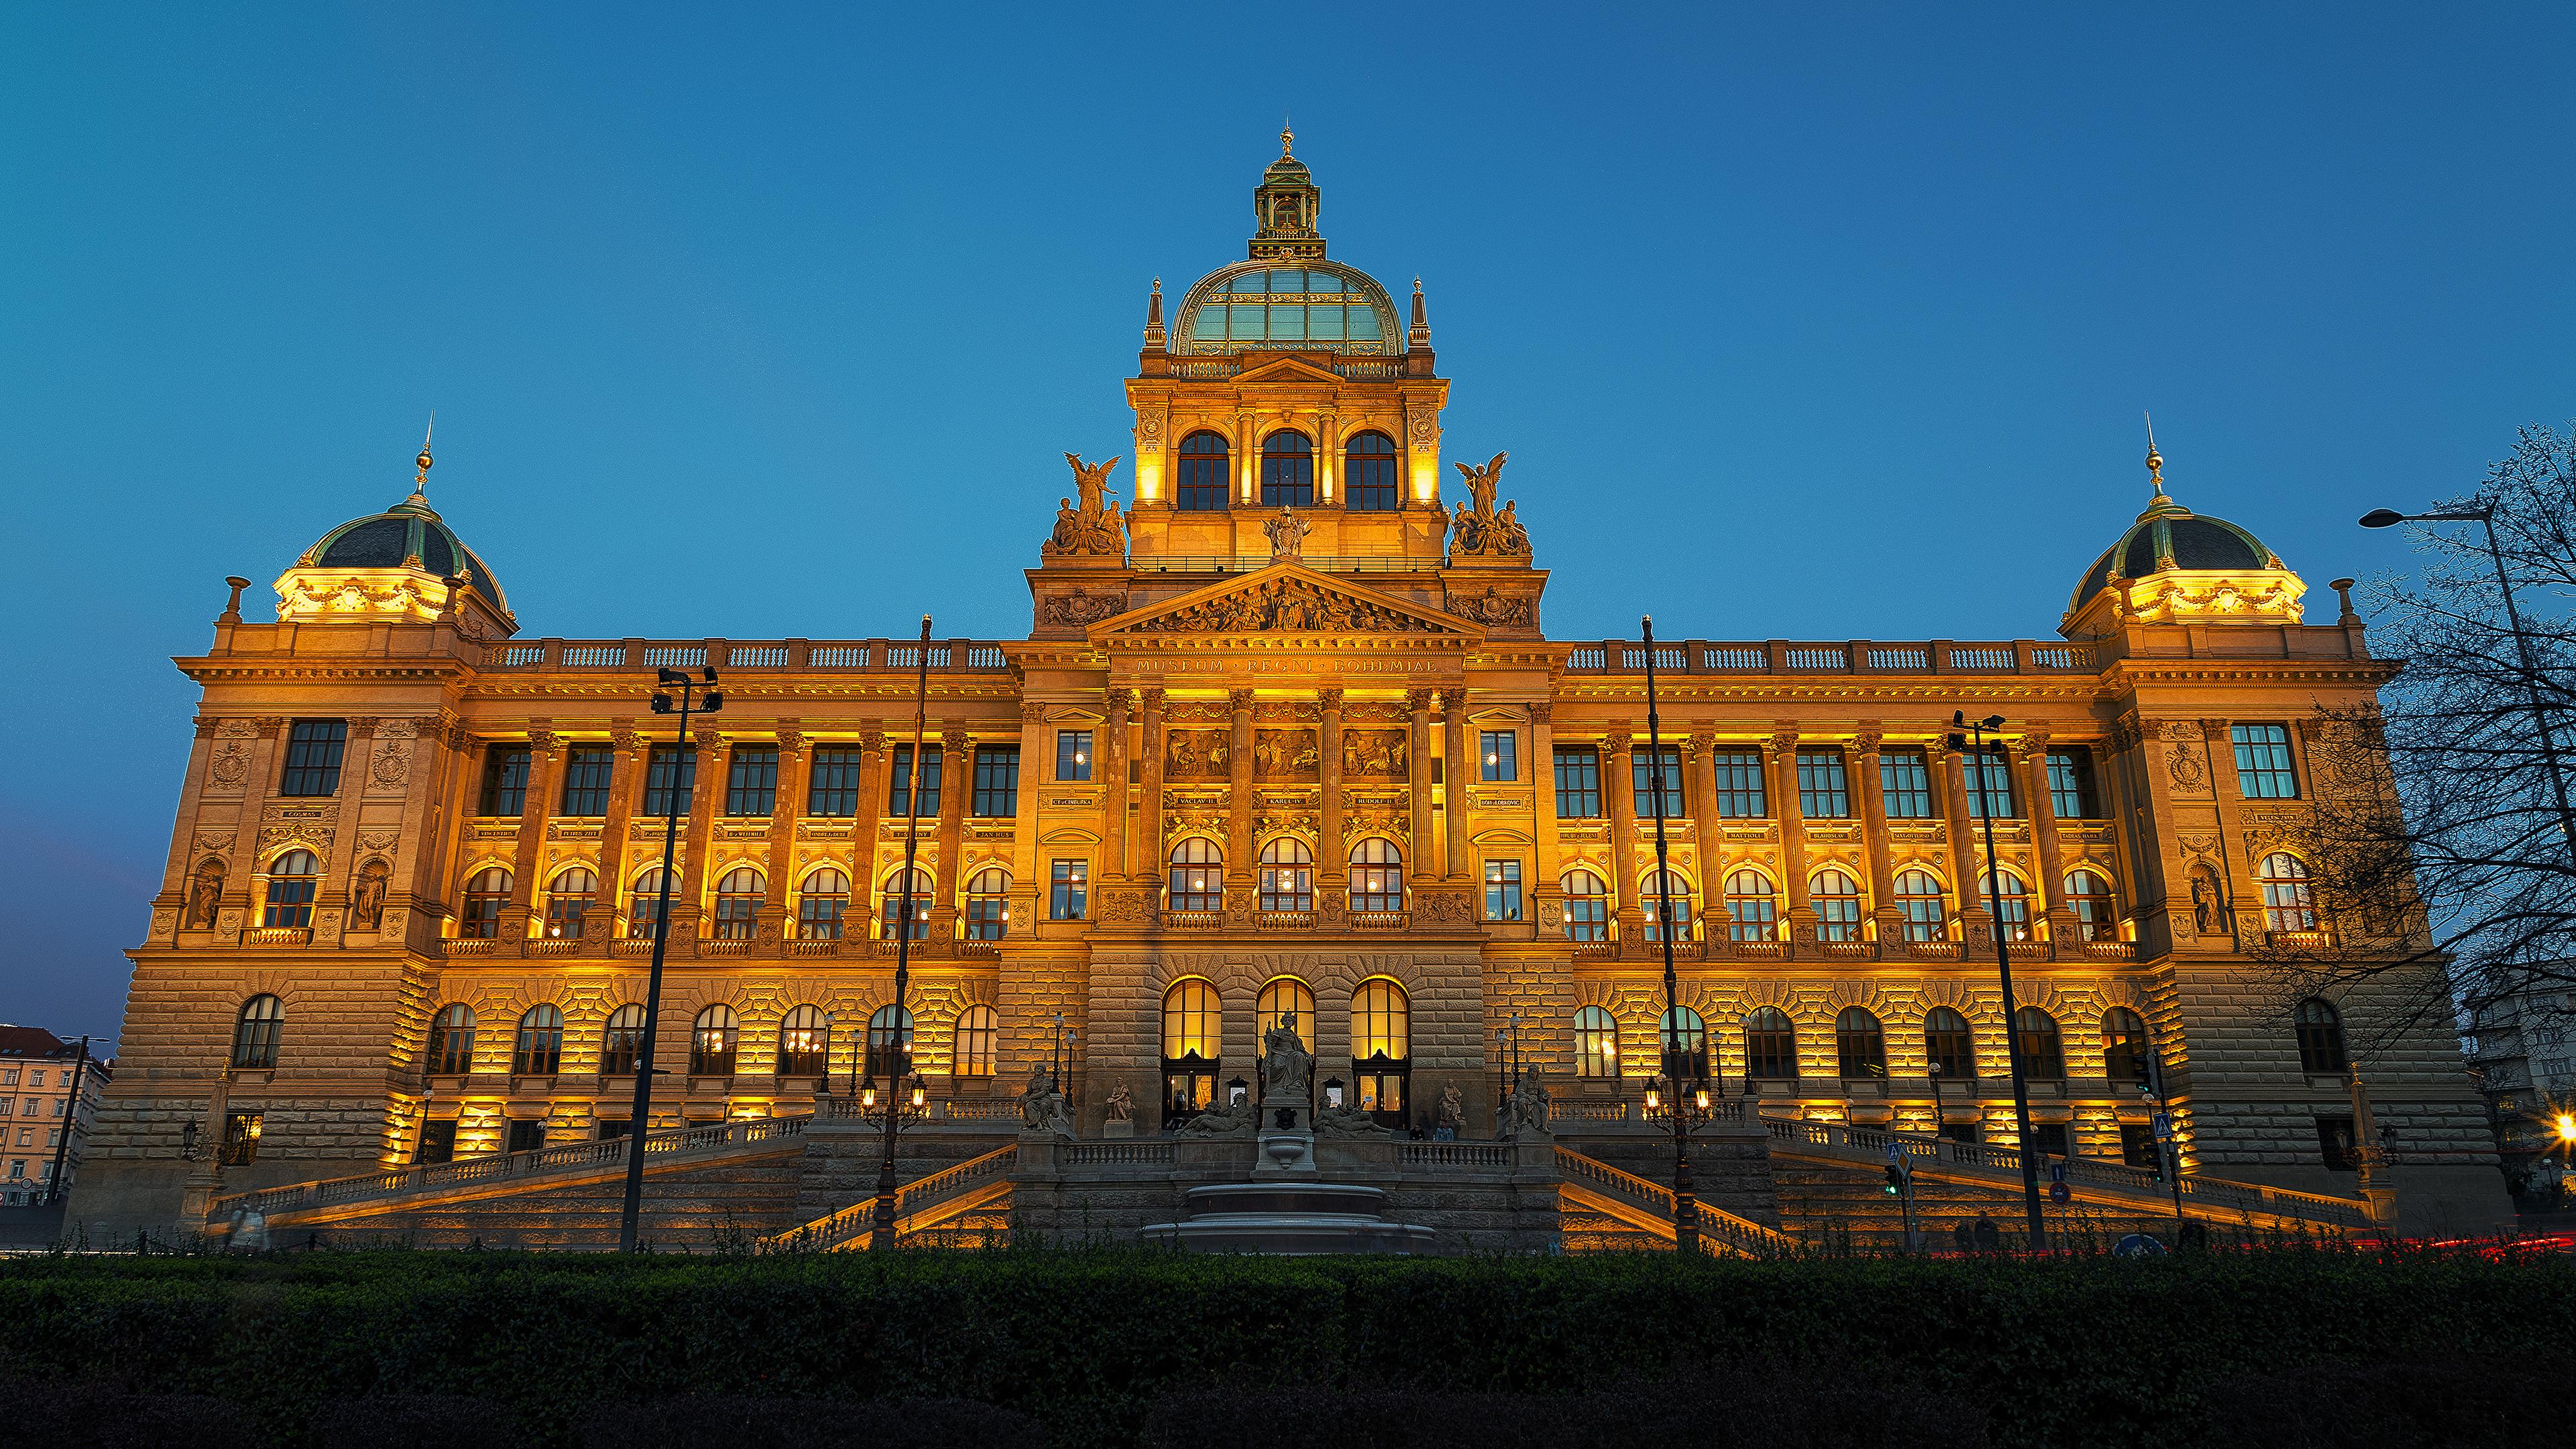 Фотография Прага Чехия музеи National Museum Лестница Вечер Уличные фонари Дома Города 3840x2160 Музей лестницы город Здания